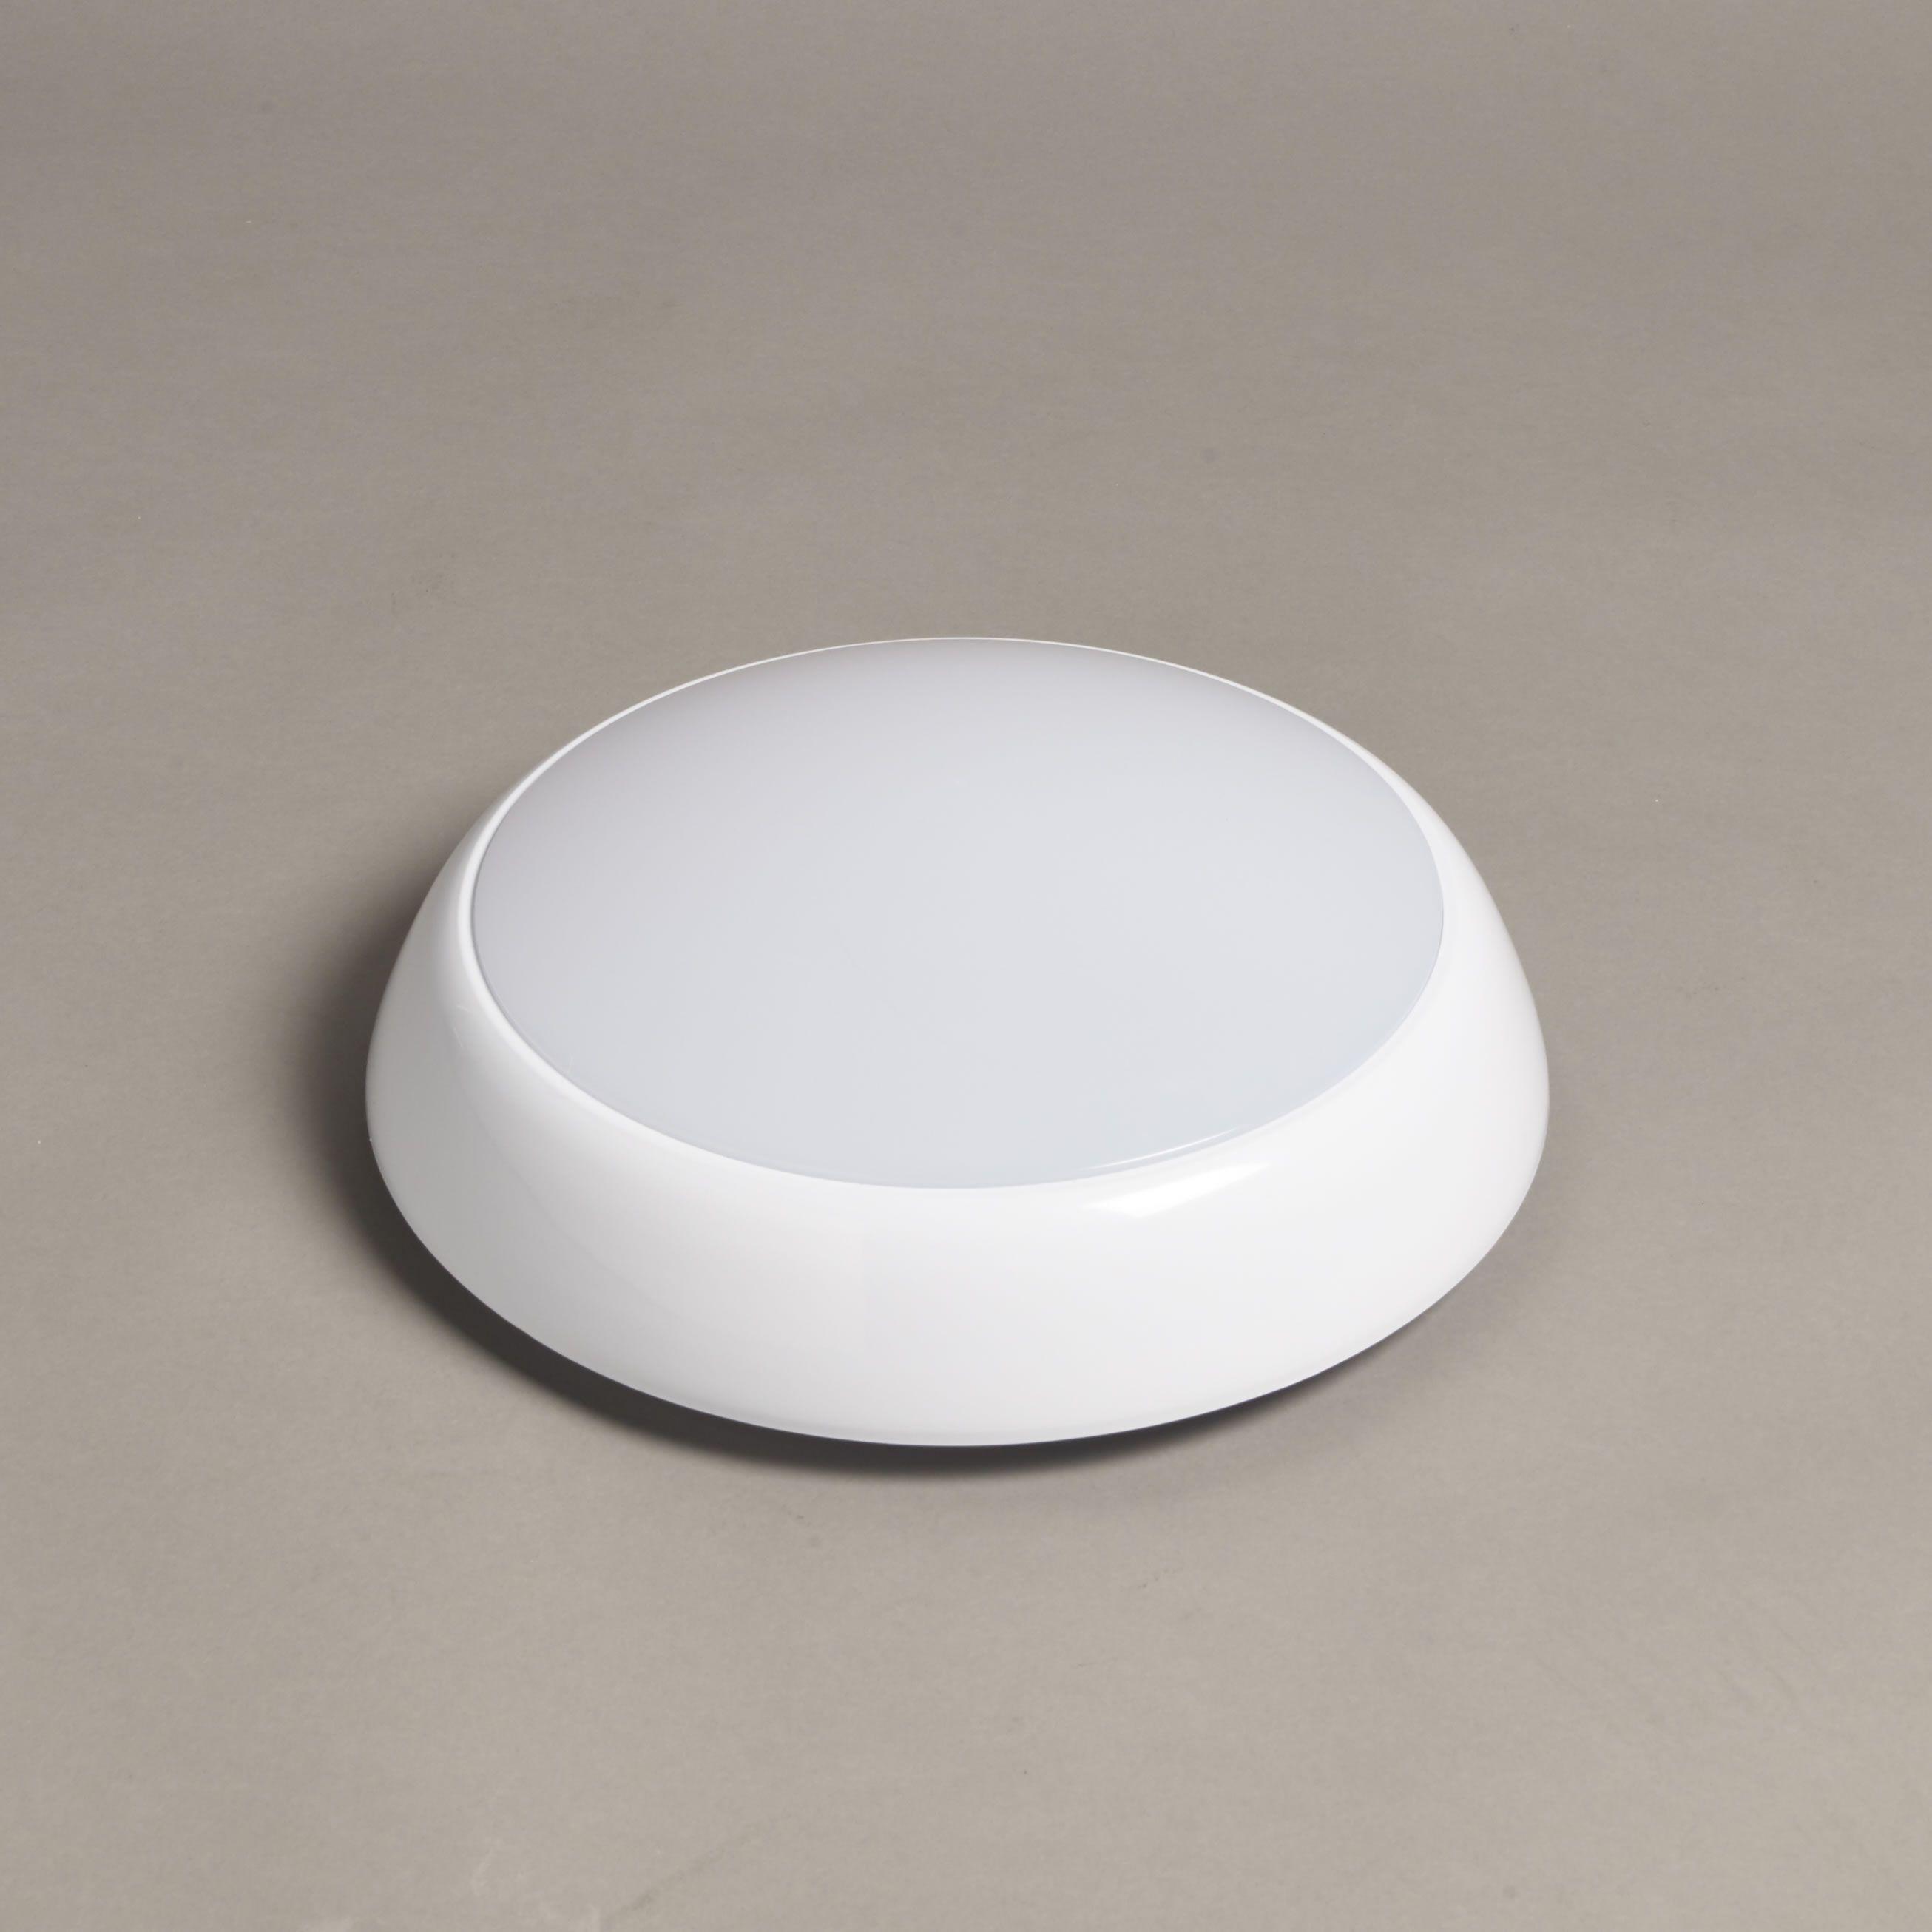 Office hallway lighting  Emergency u Sensor LED Replacement for Bulkhead fittings  LED